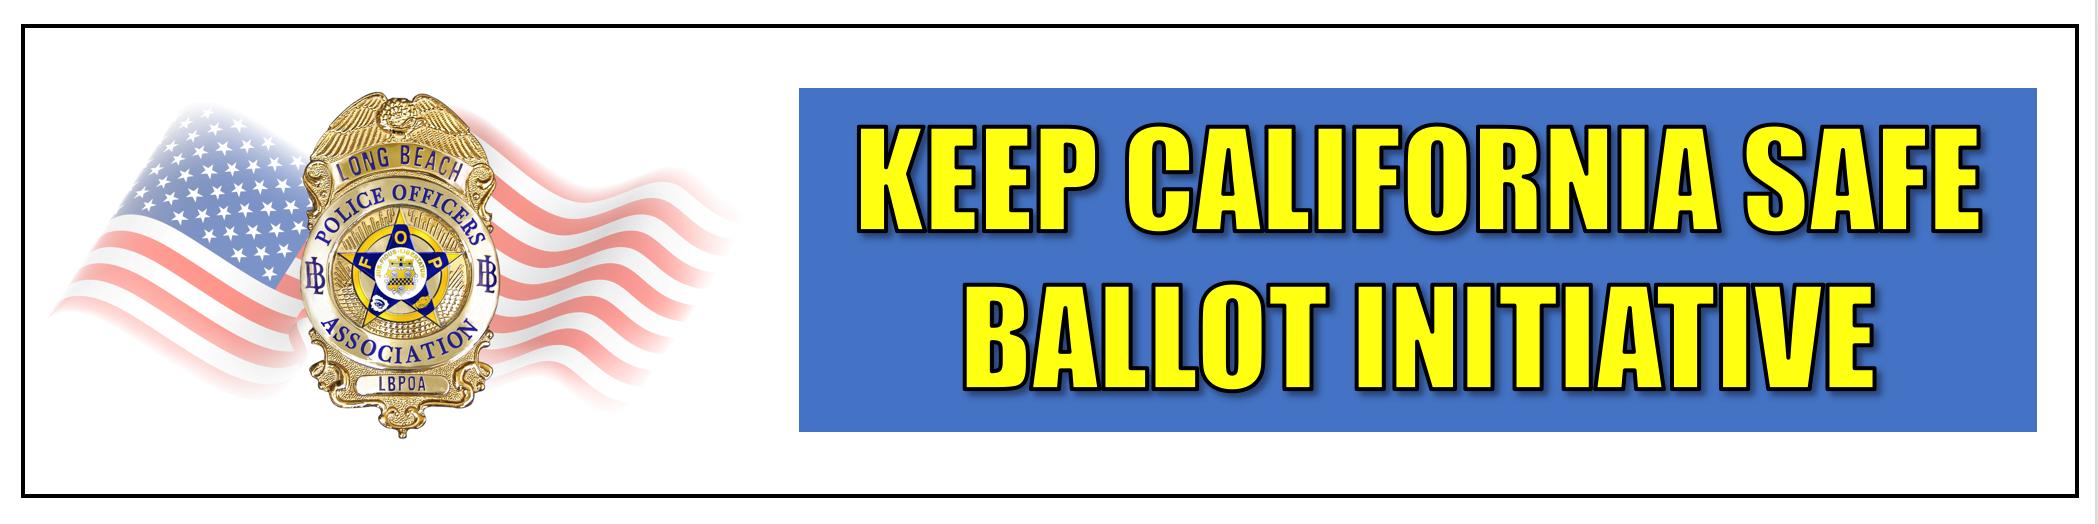 Keep-California-Safe-banner